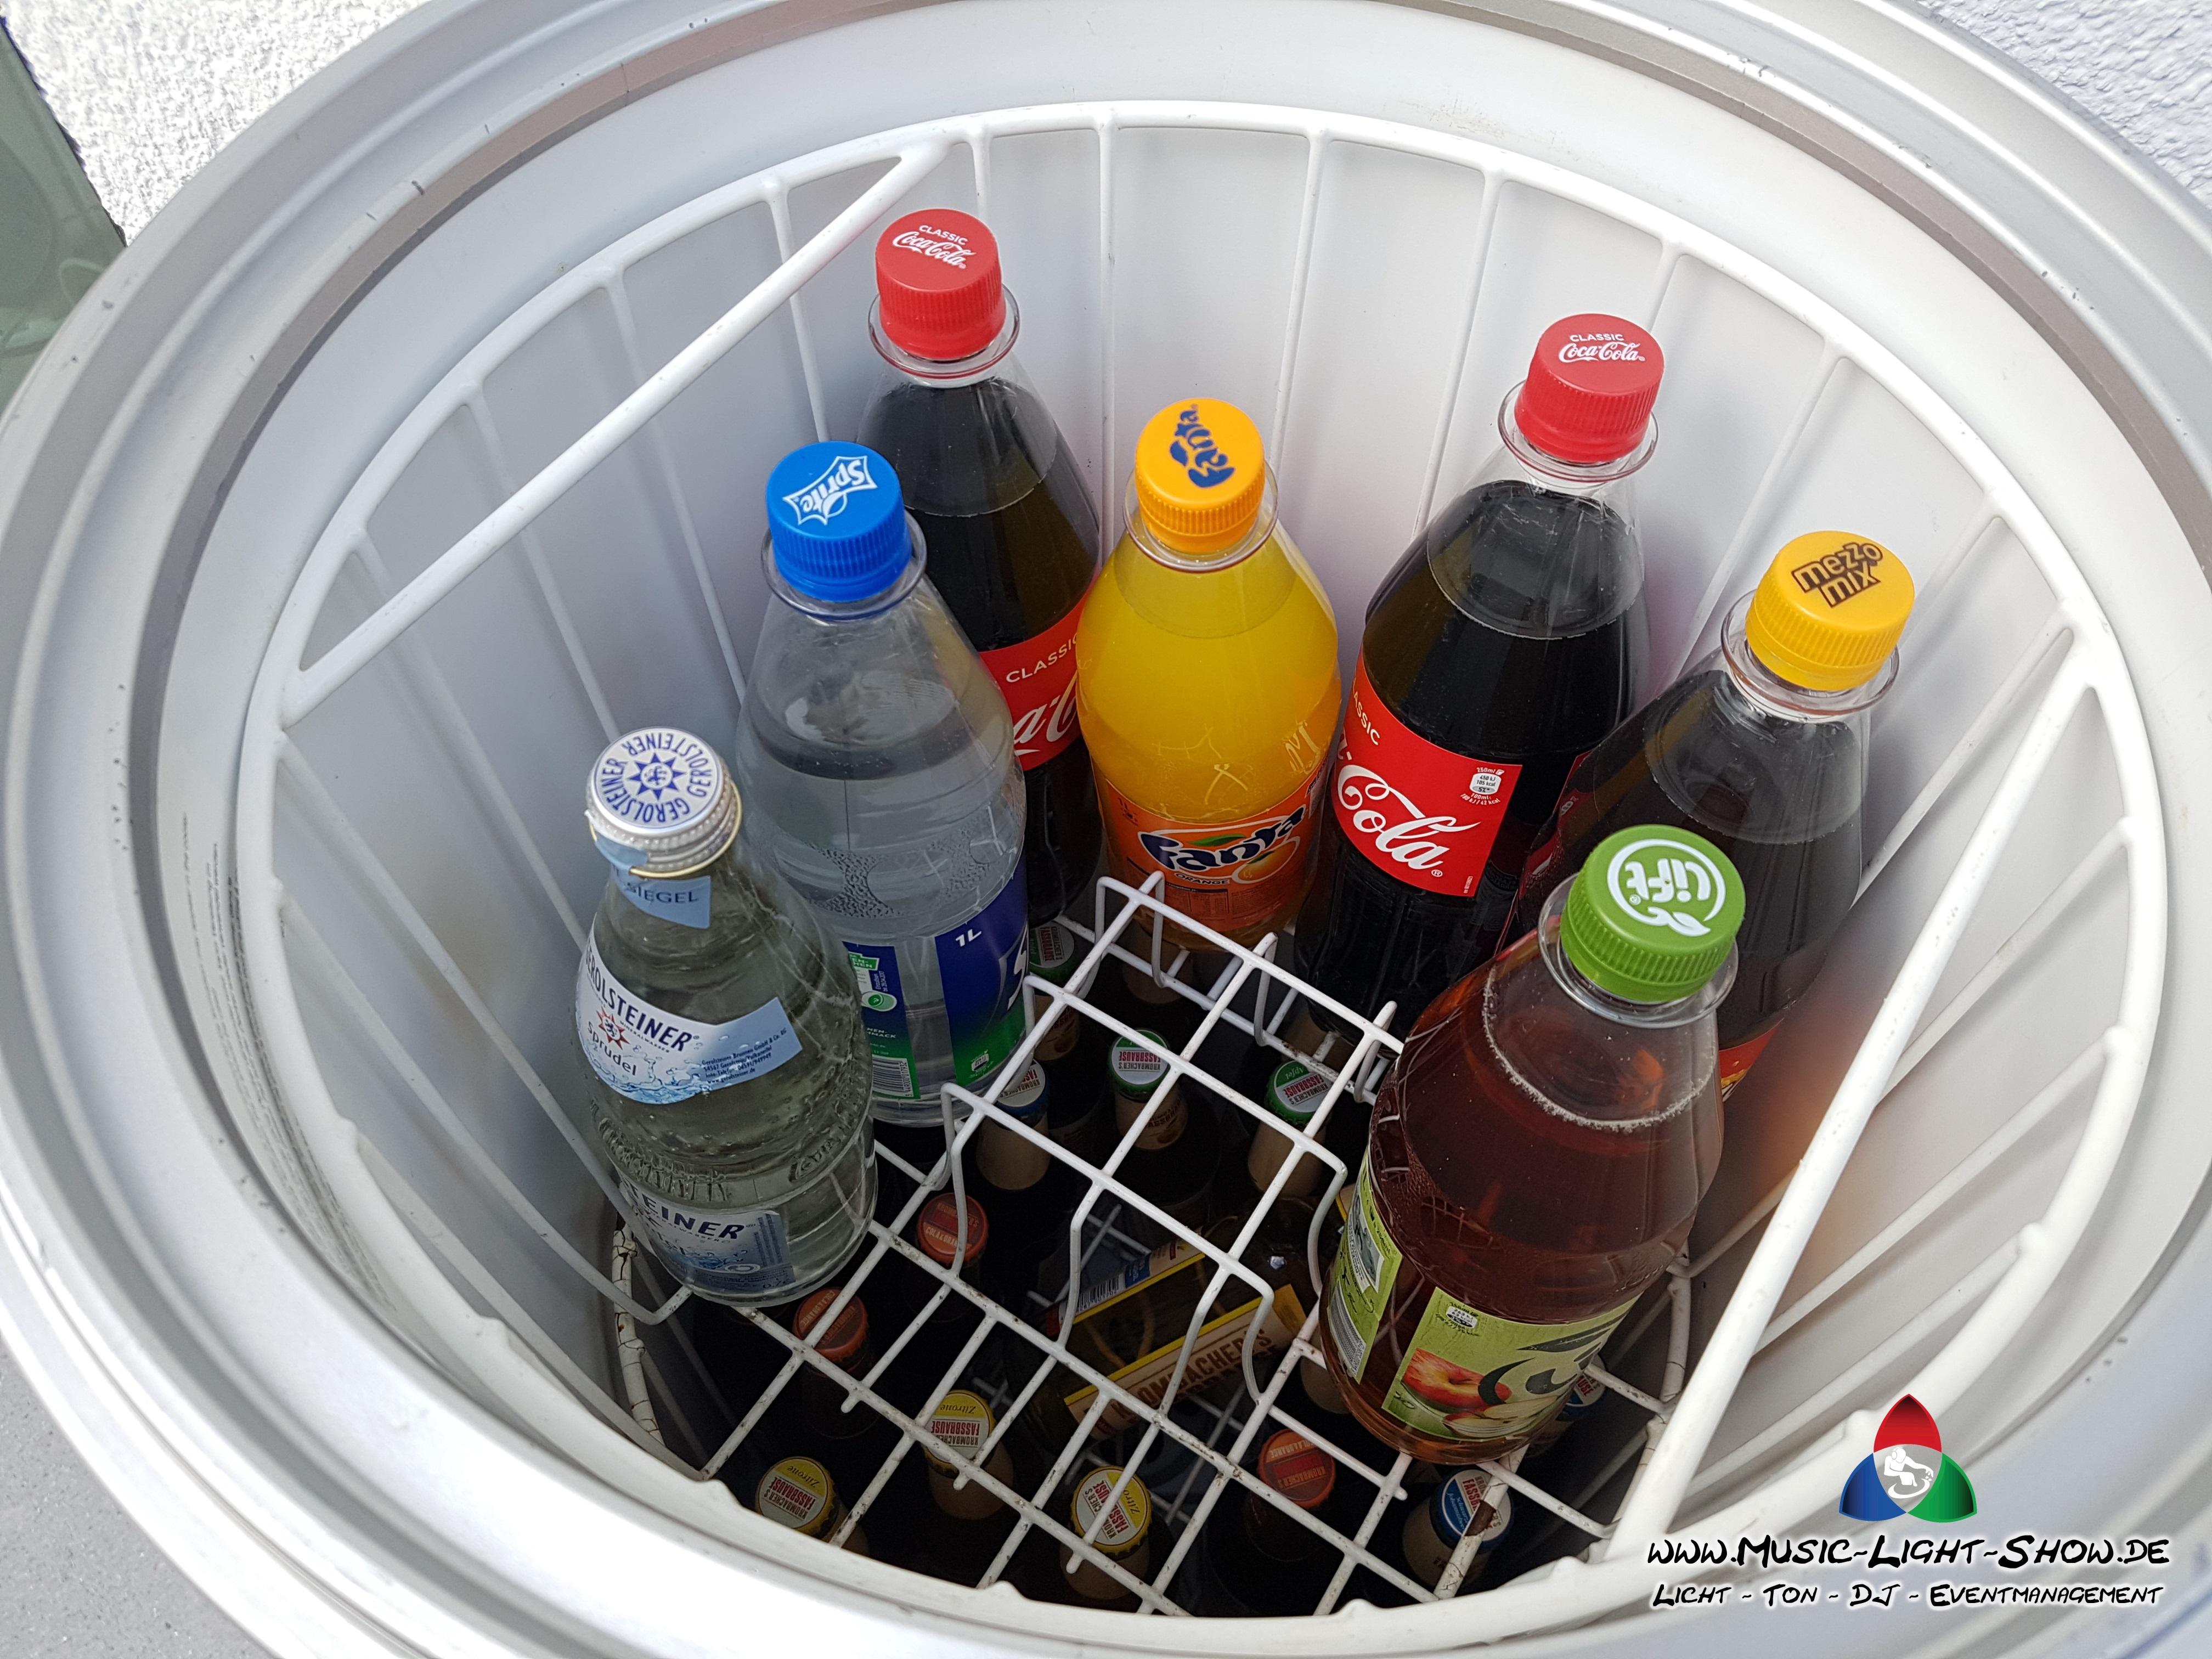 Red Bull Dosen Kühlschrank : Dosenspender kühlschrank dosenspender mit peltier kühlung make